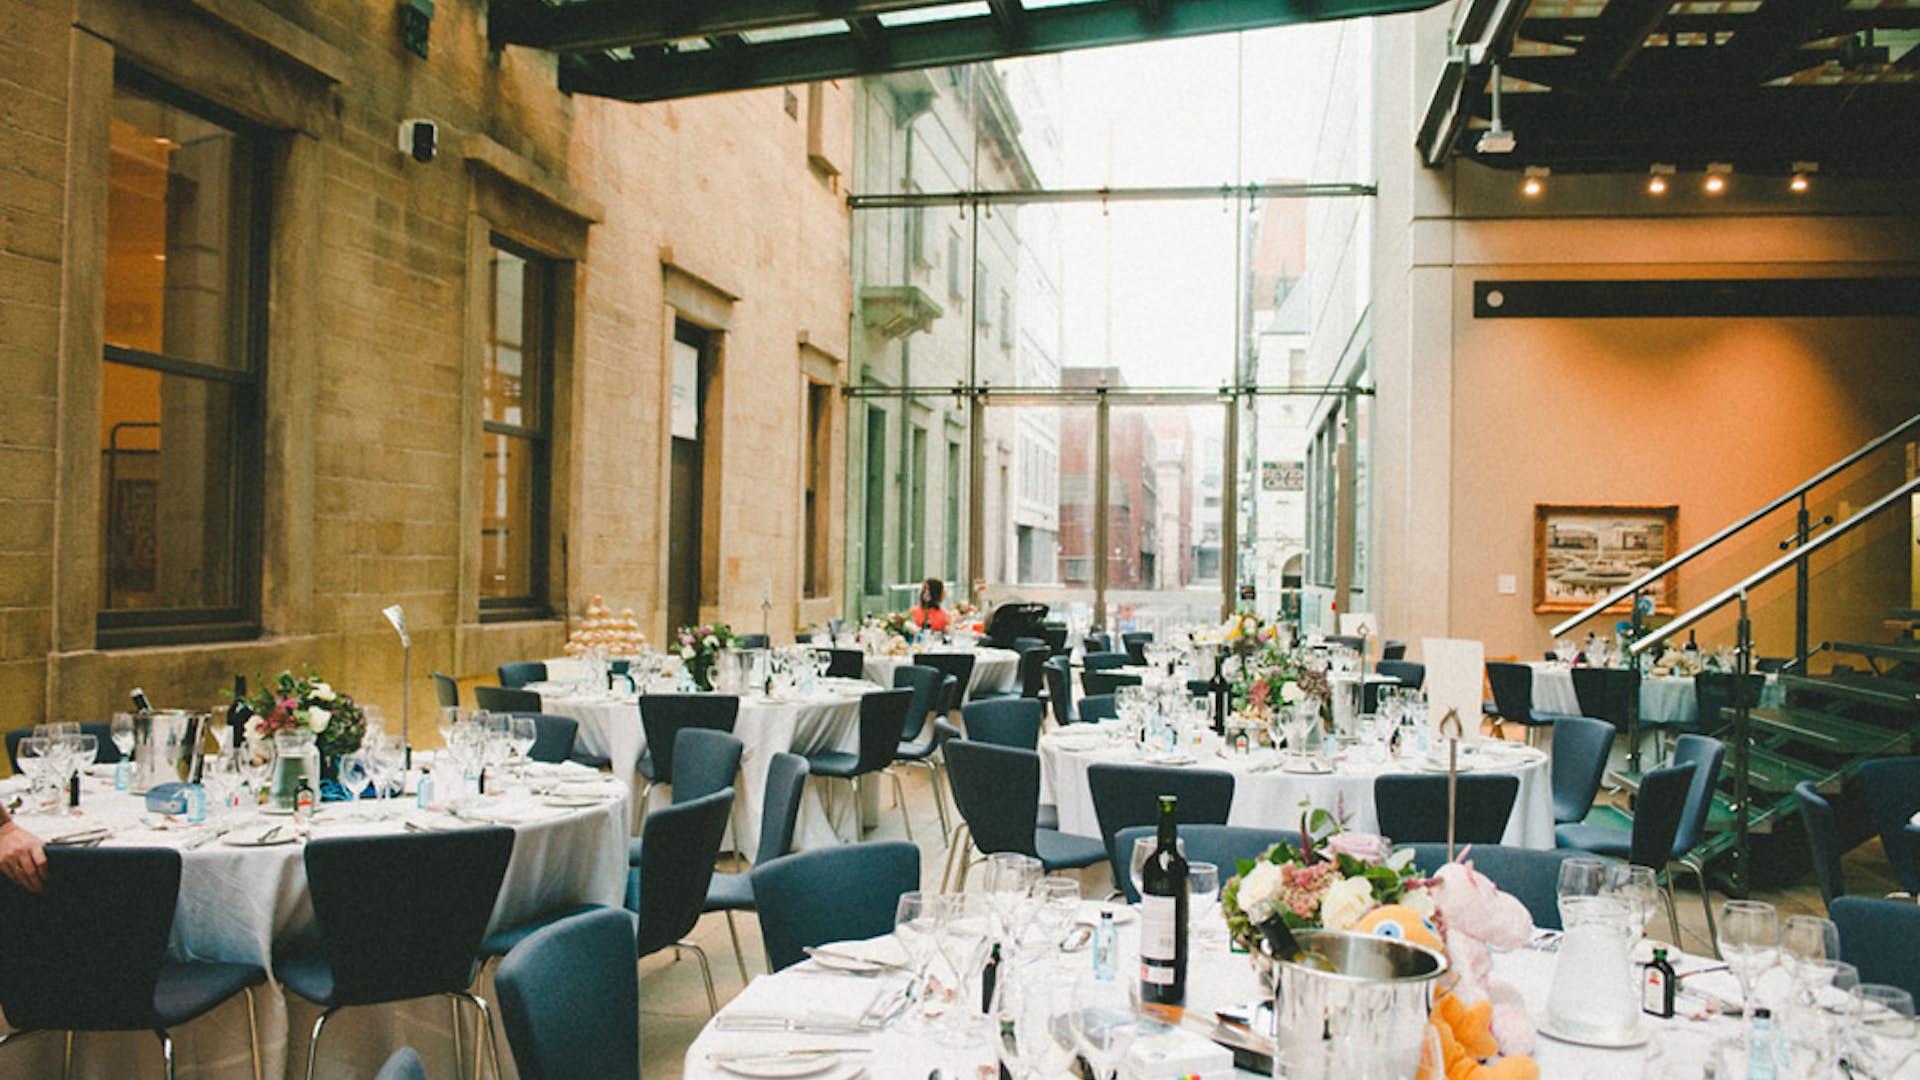 Atrium Weddings Hire Manchester Art Gallery